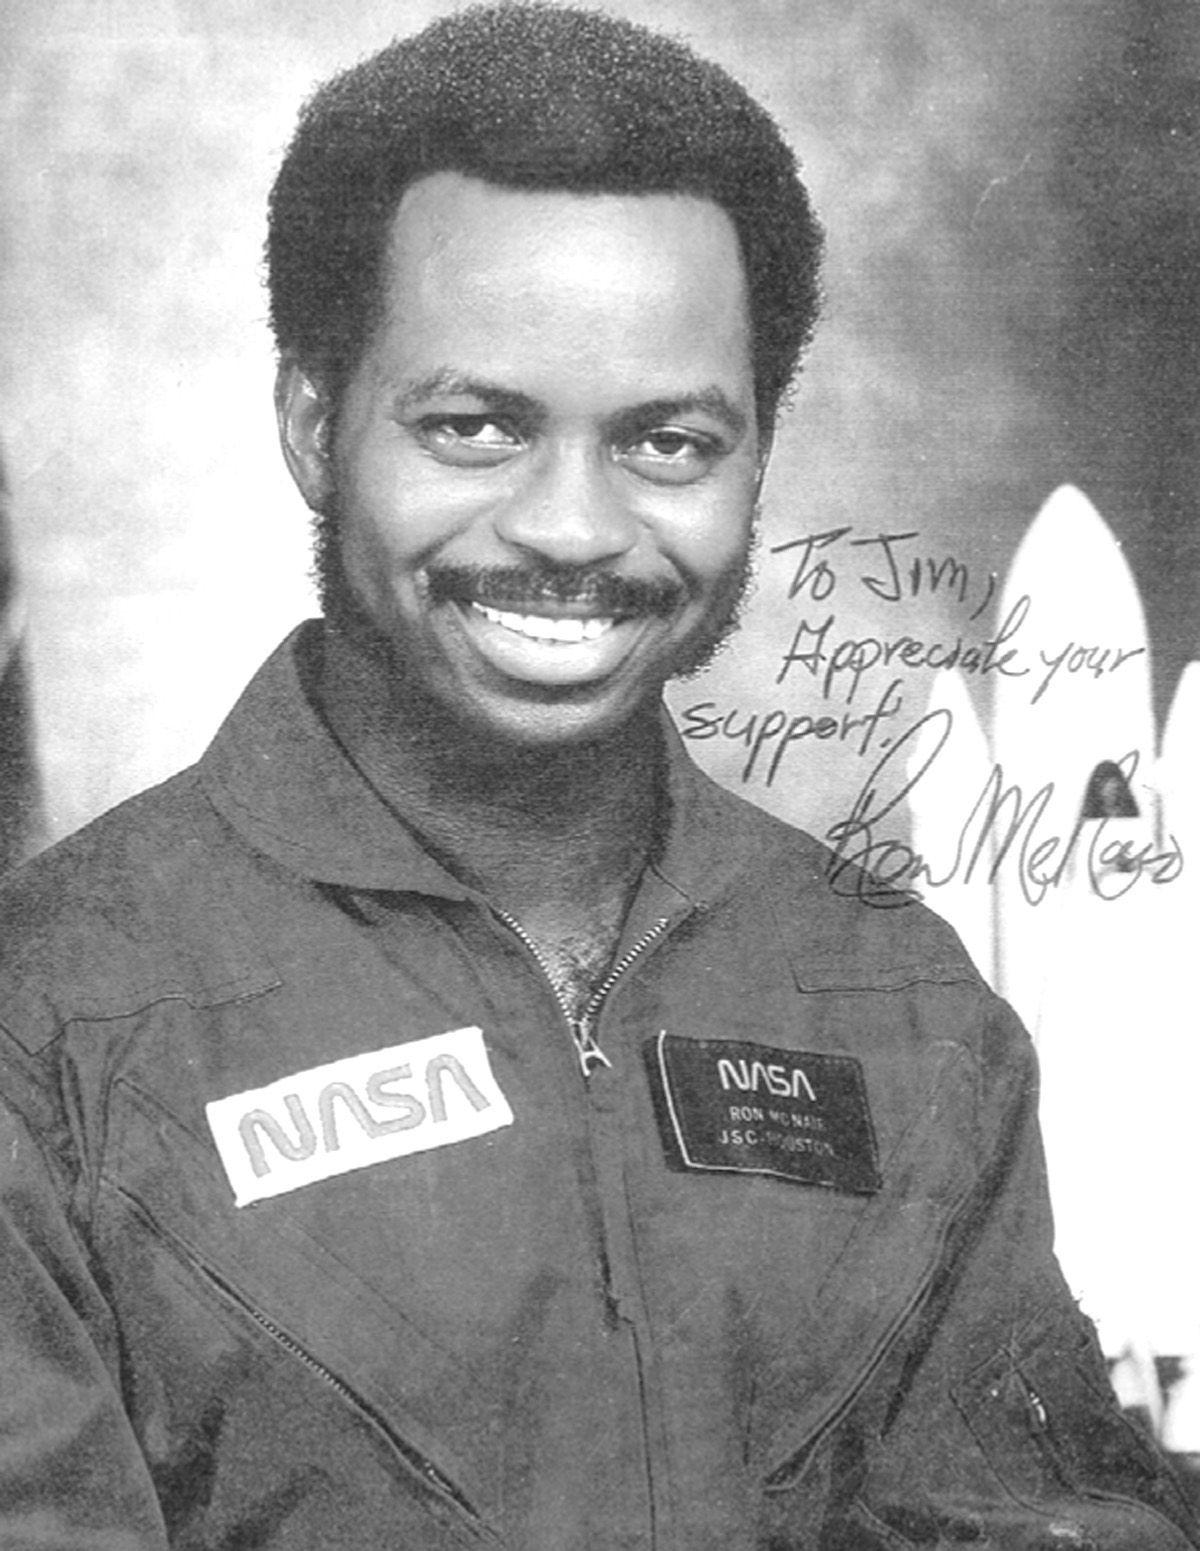 famous astronaut mcnair - photo #5